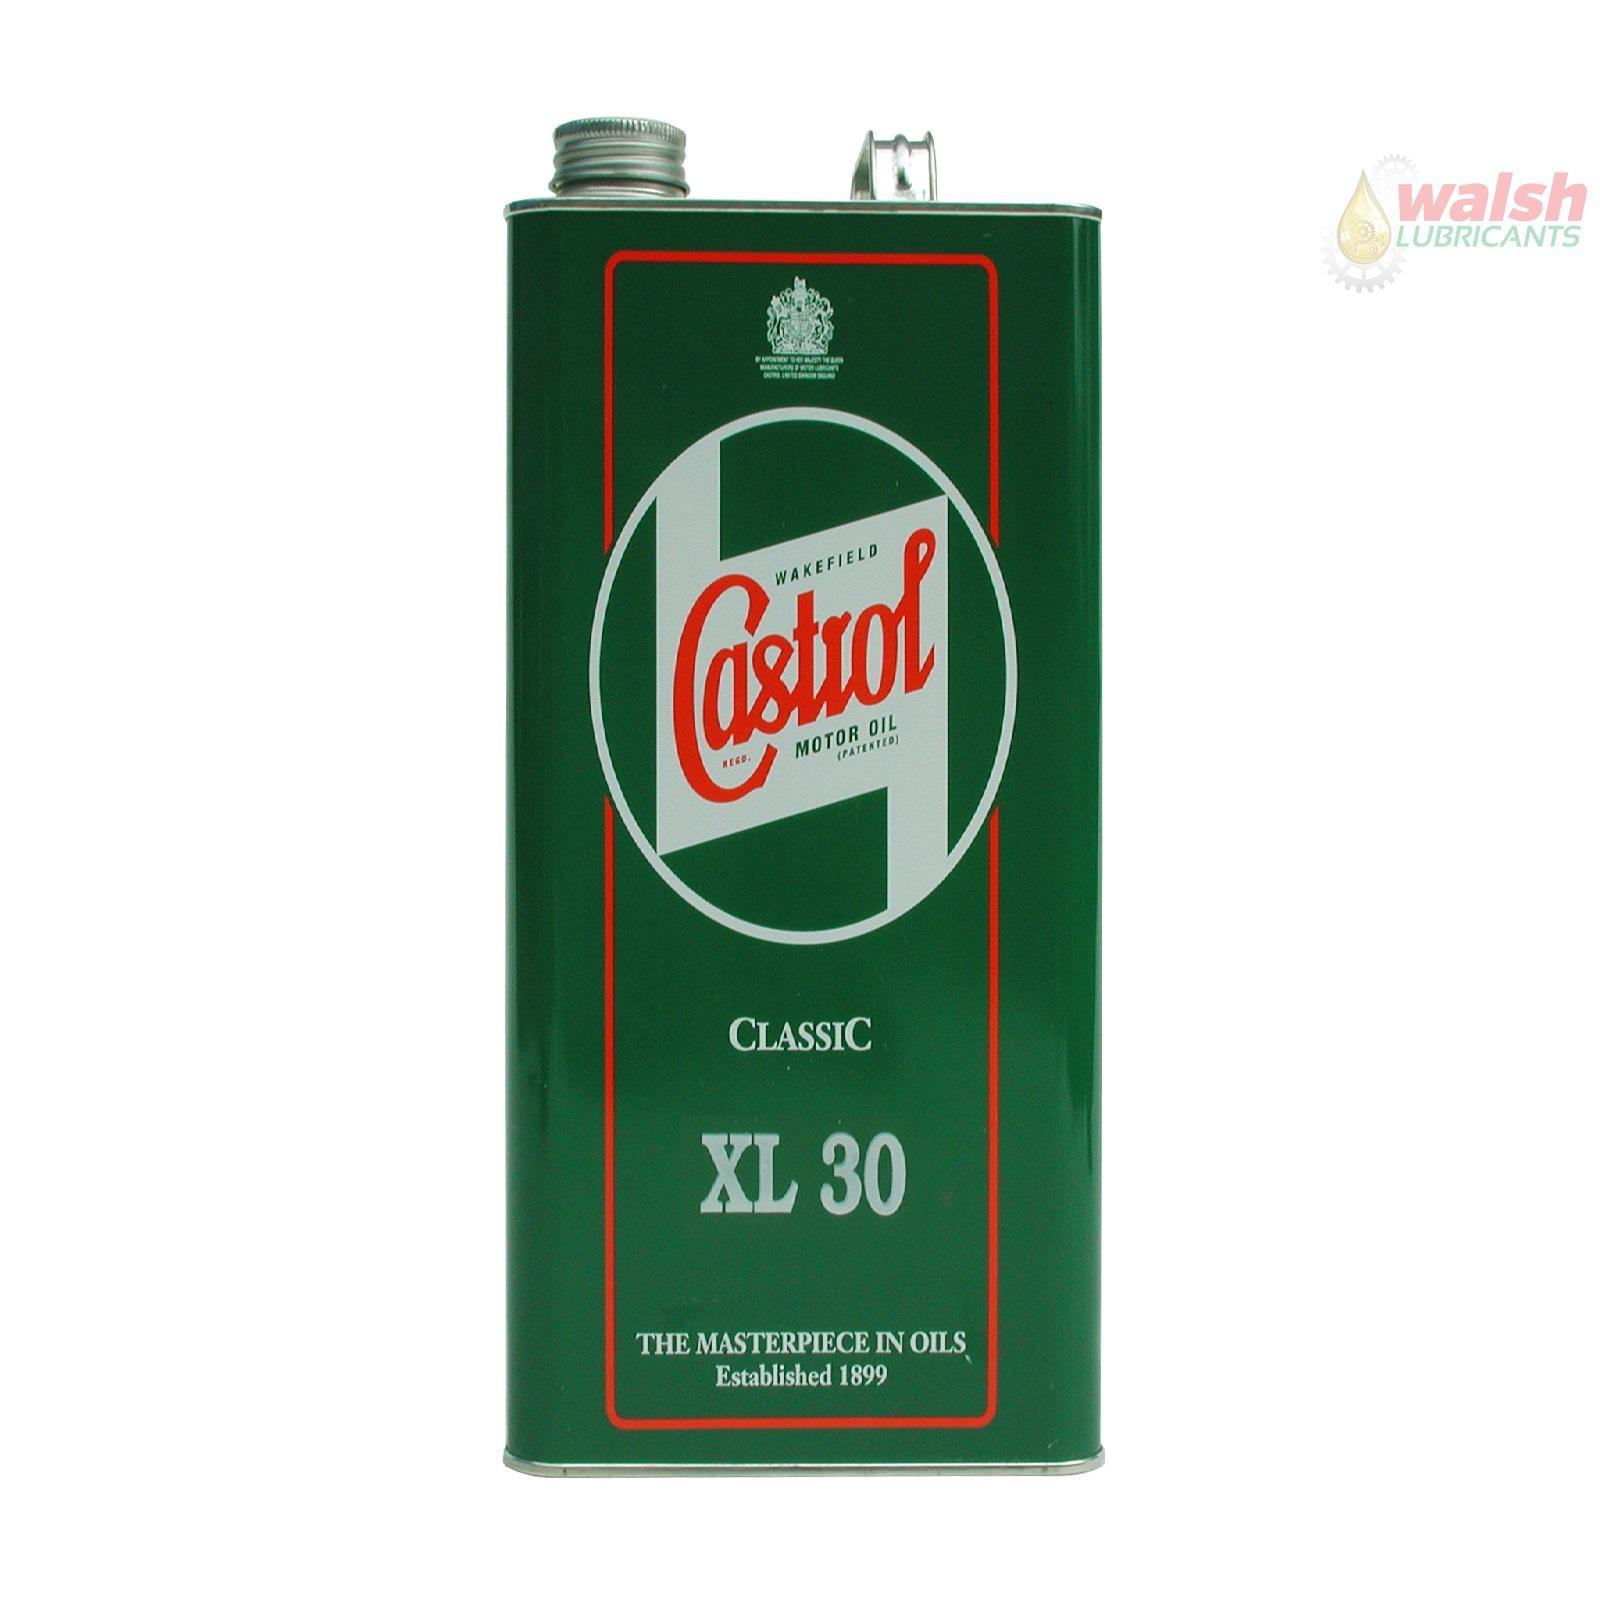 Castrol Classic Engine Oils